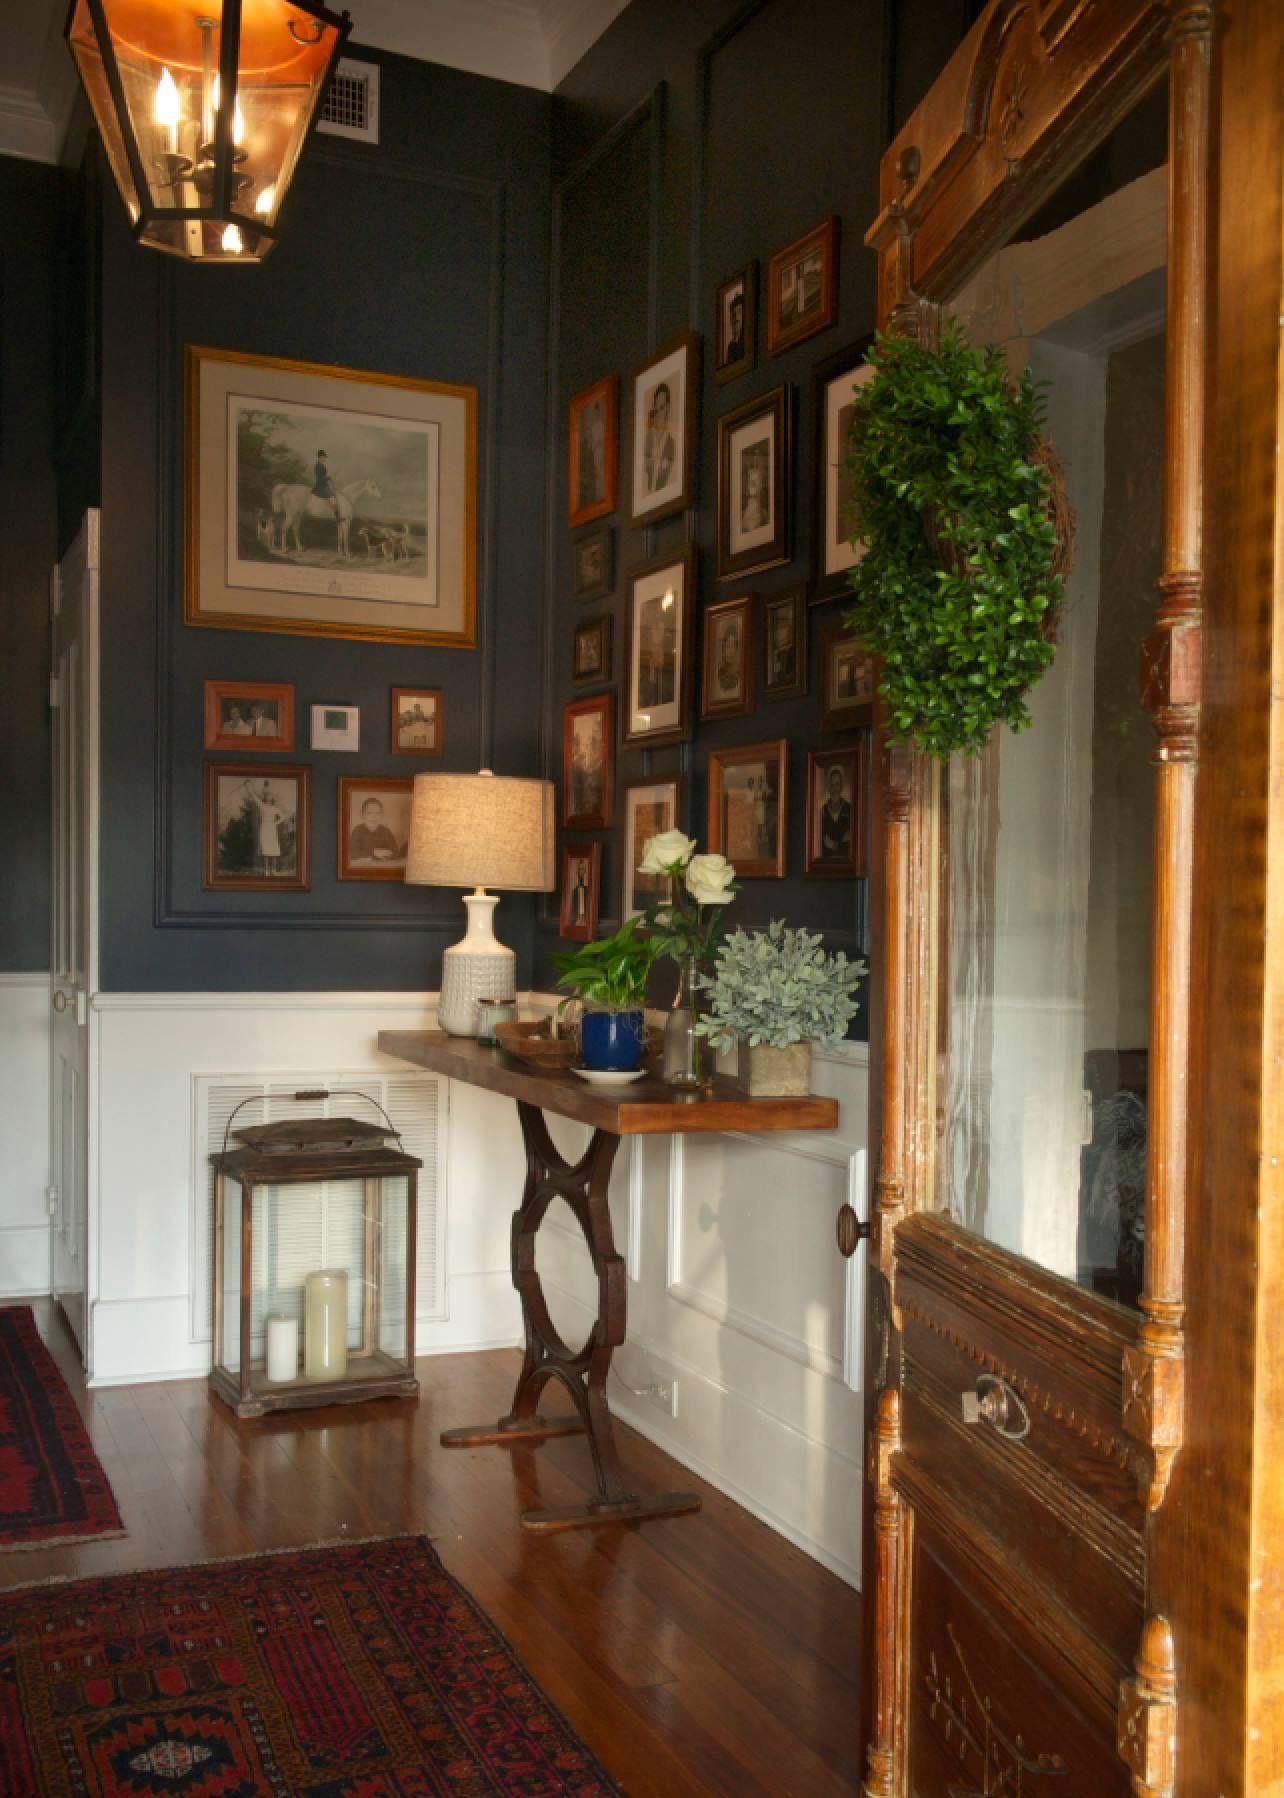 Missmollyvintage Com Nbspmissmollyvintage Resources And Information Home Town Hgtv Home Decor Home Decor Tips